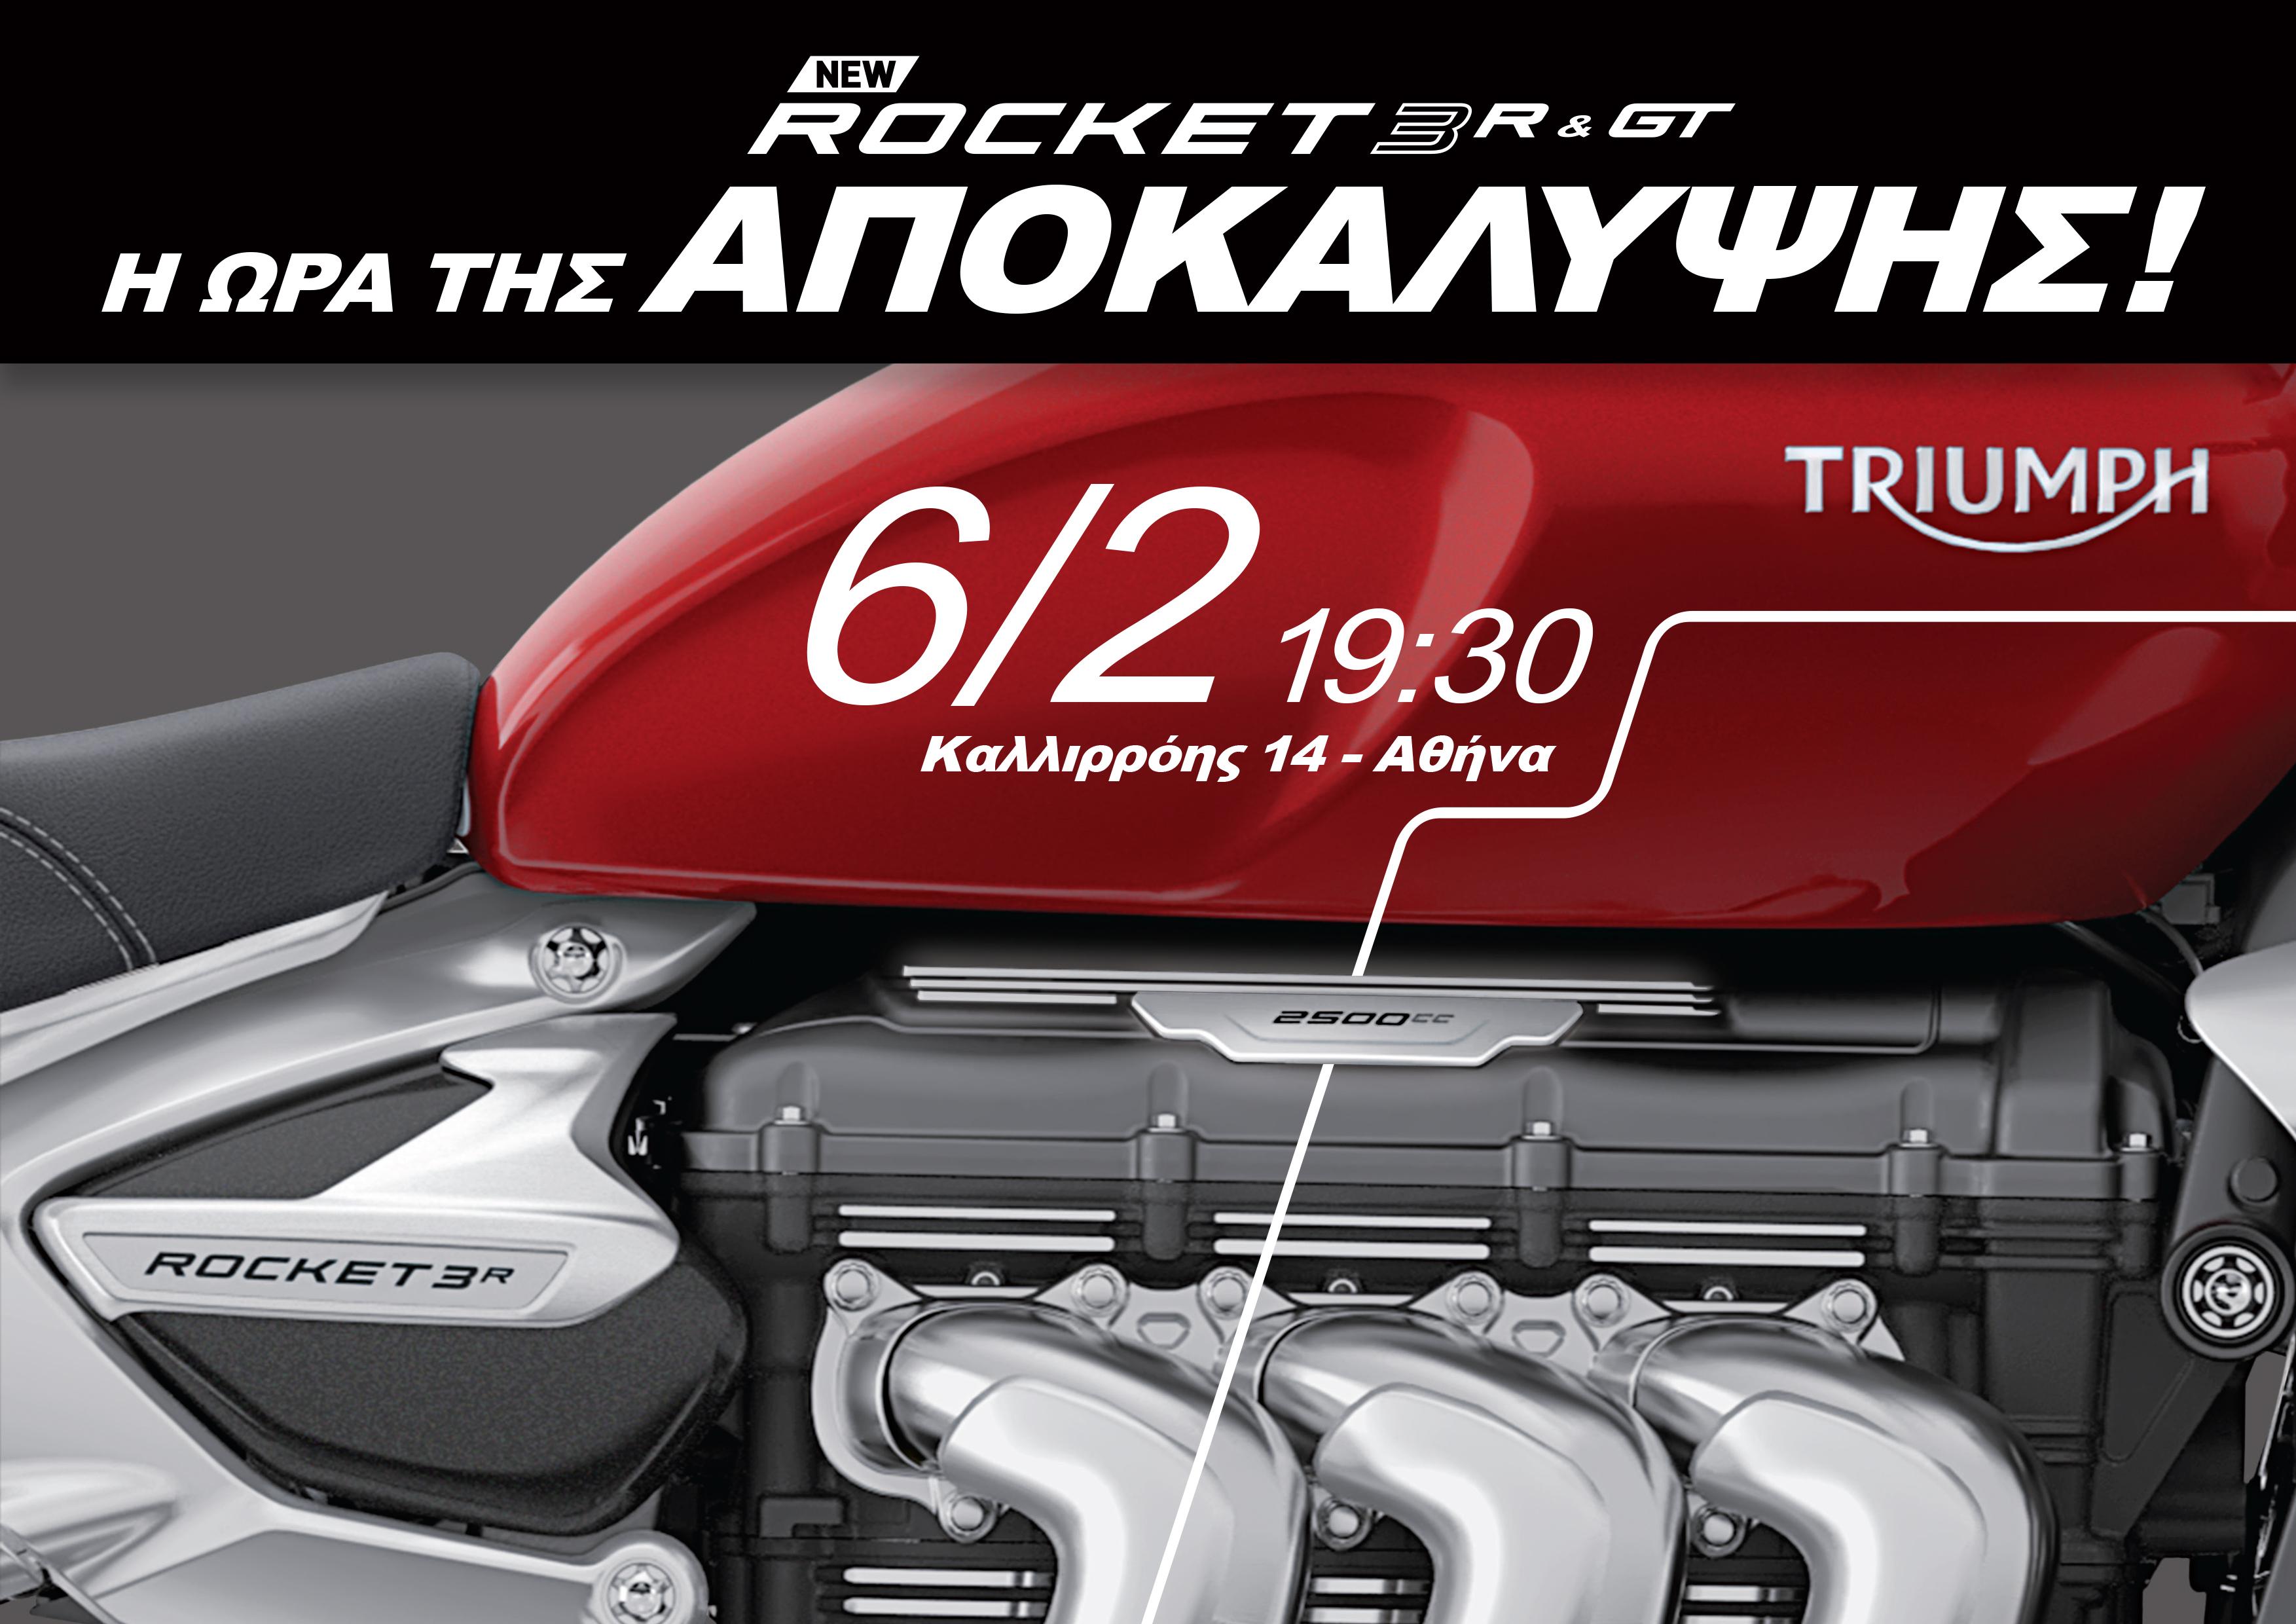 TRIUMPH ROCKET 3 R & GT: Η ΩΡΑ ΤΗΣ ΑΠΟΚΑΛΥΨΗΣ!